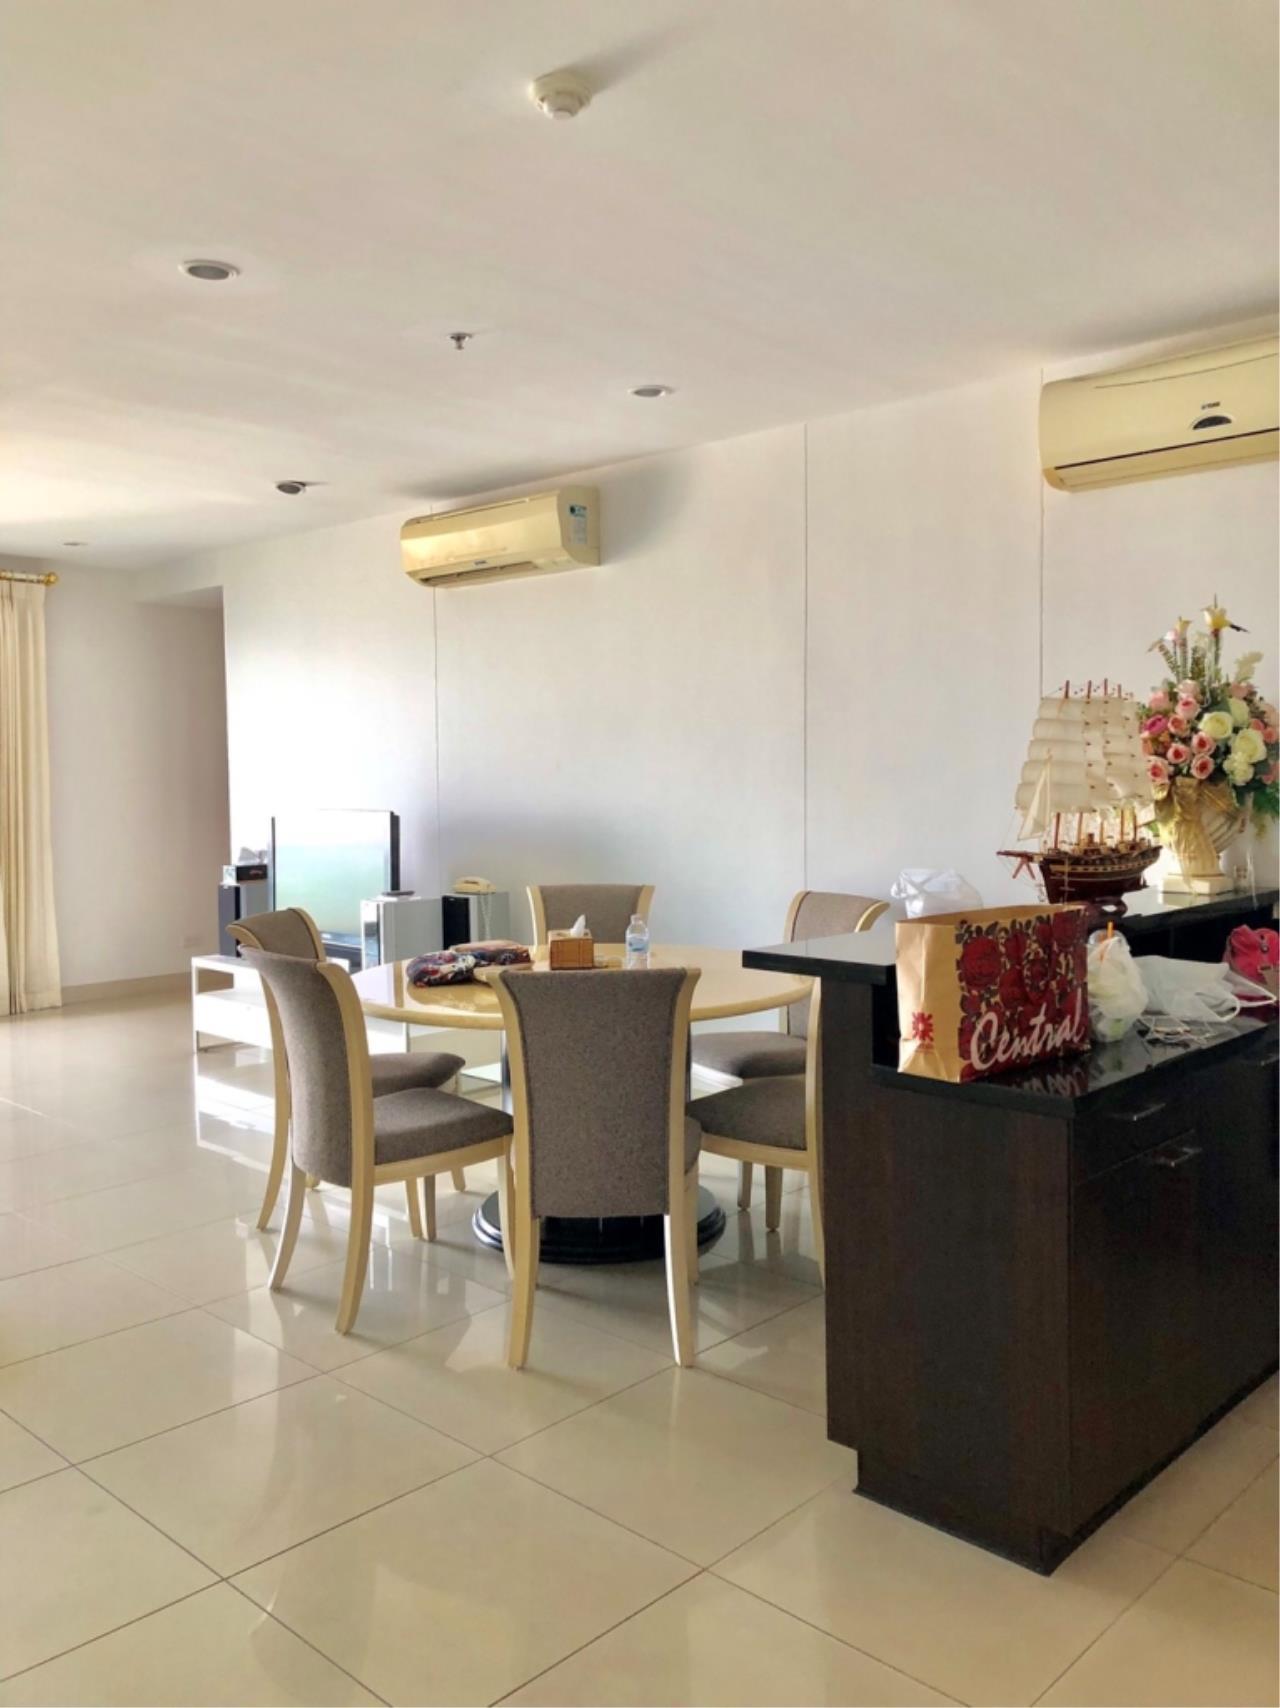 Century21 Skylux Agency's The Star Estate @ Narathiwas / Condo For Sale / 3 Bedroom / 165.34 SQM / BTS Chong Nonsi / Bangkok 5